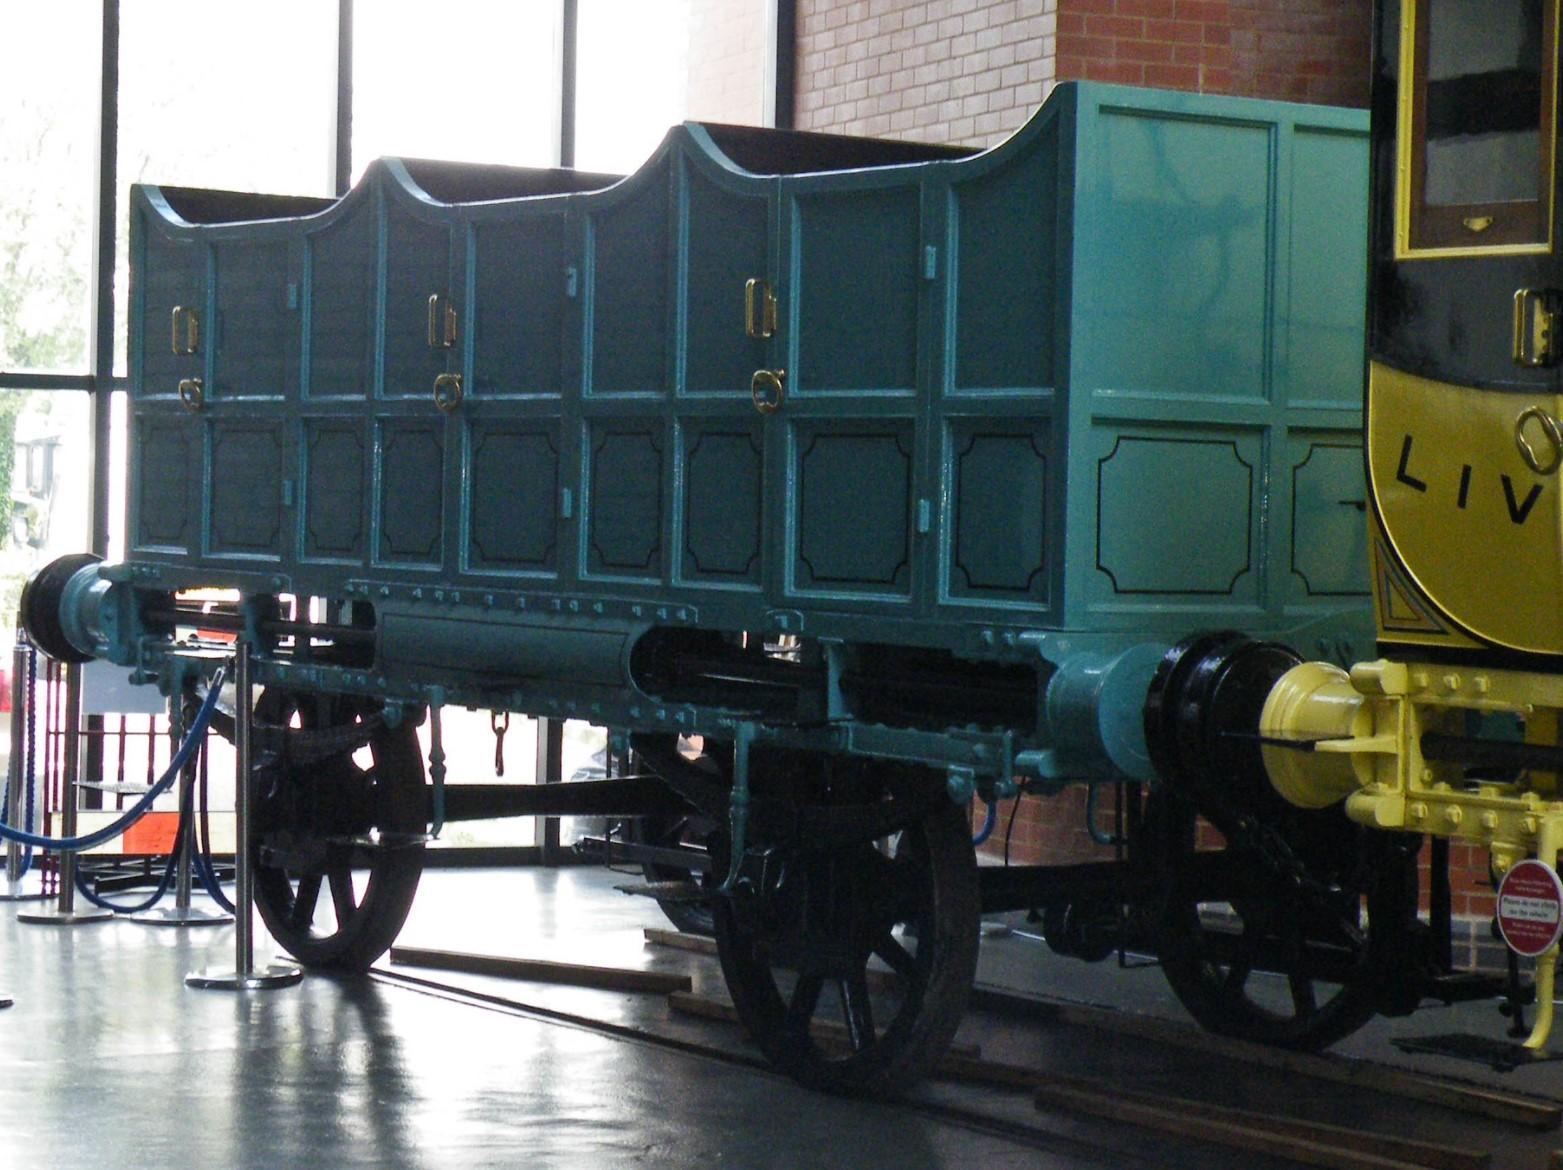 Replica open coach at the National Railway Museum in June 2012. ©Dan Adkins